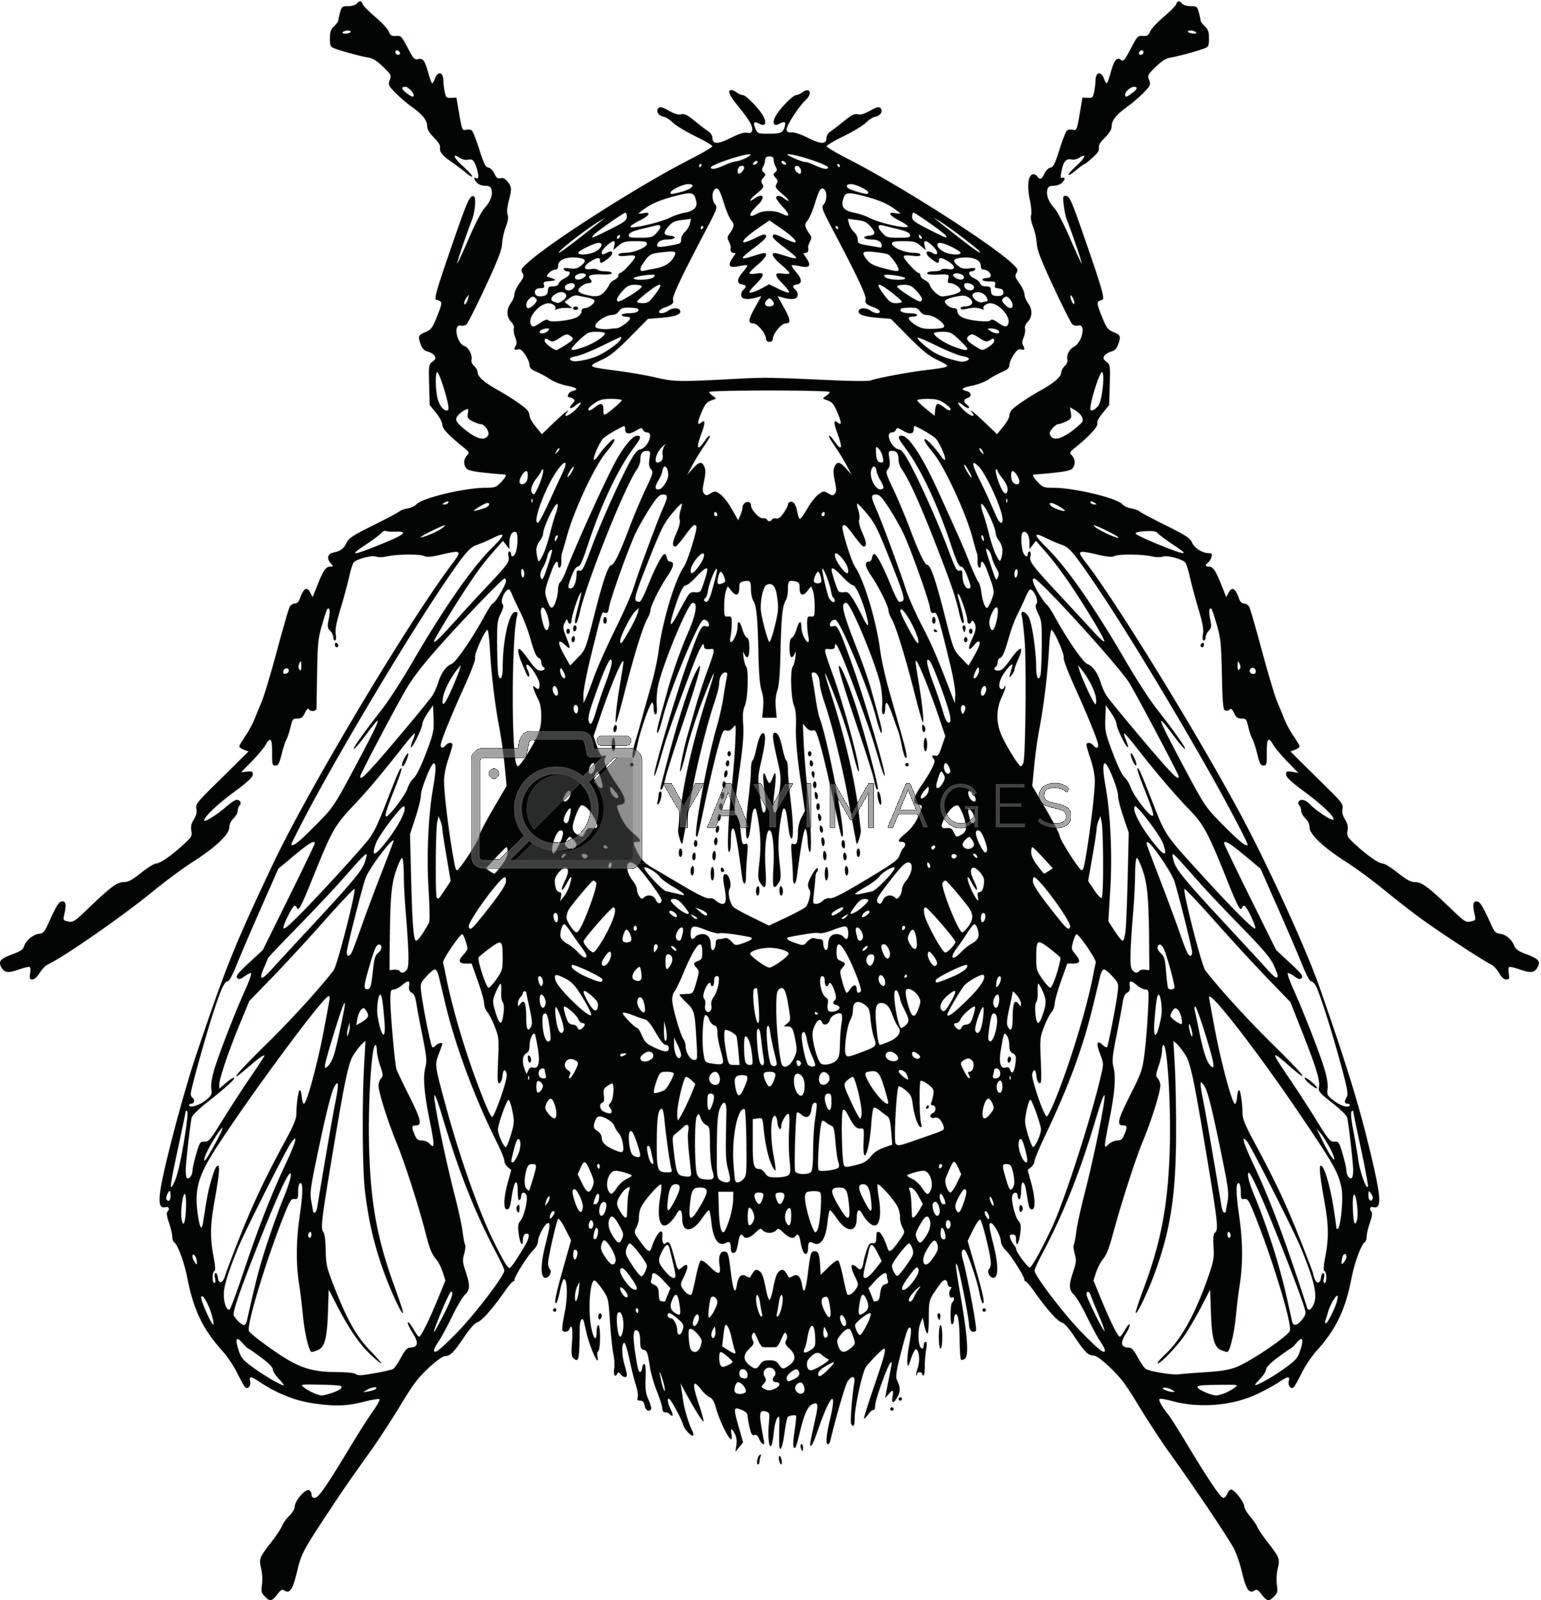 hand drawn, sketch, cartoon illustration of fly